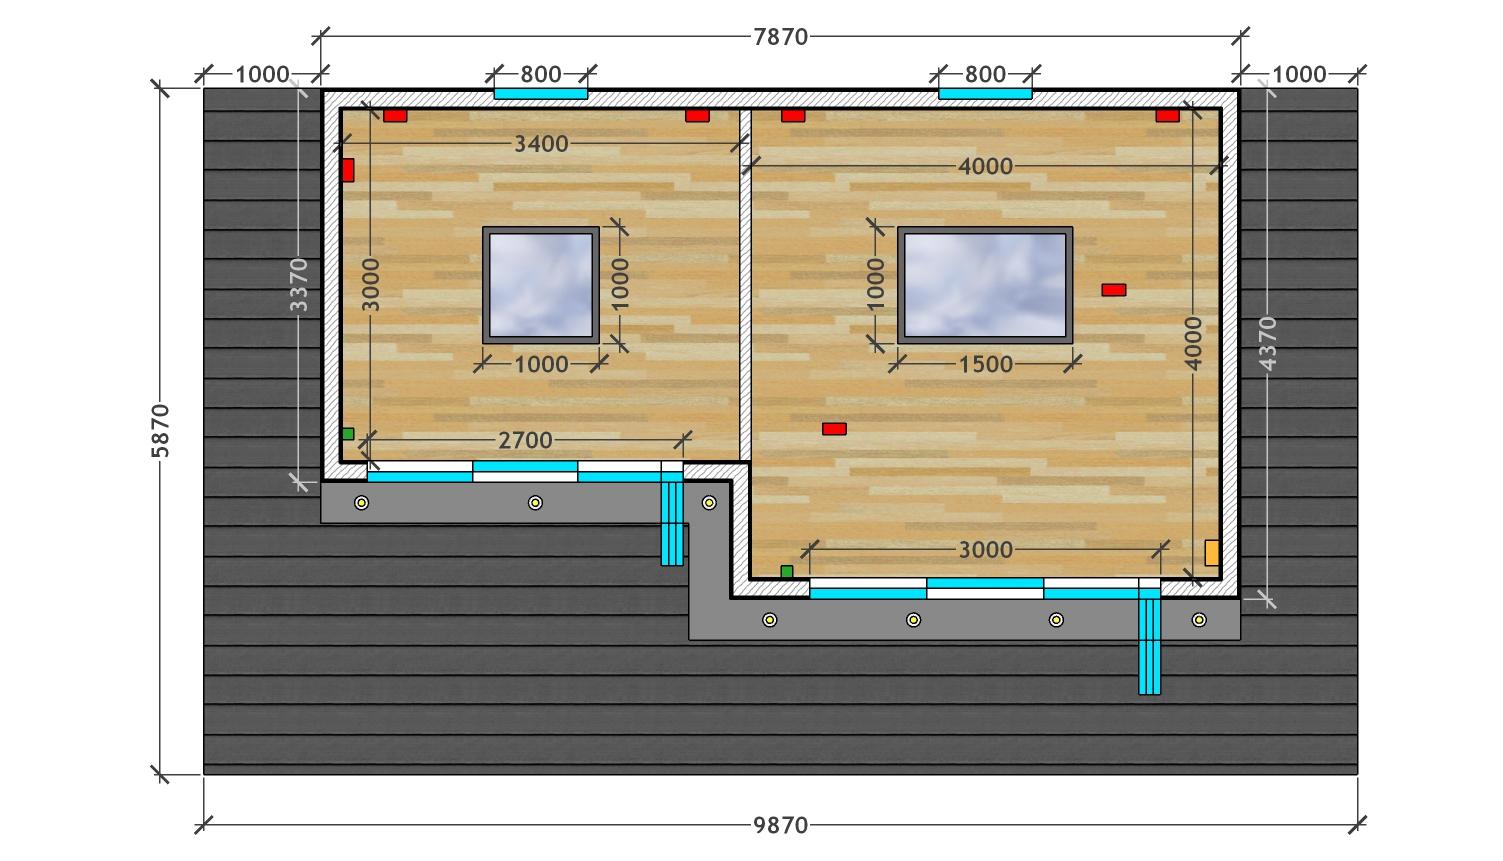 Floorplan of bespoke multipurpose garden room